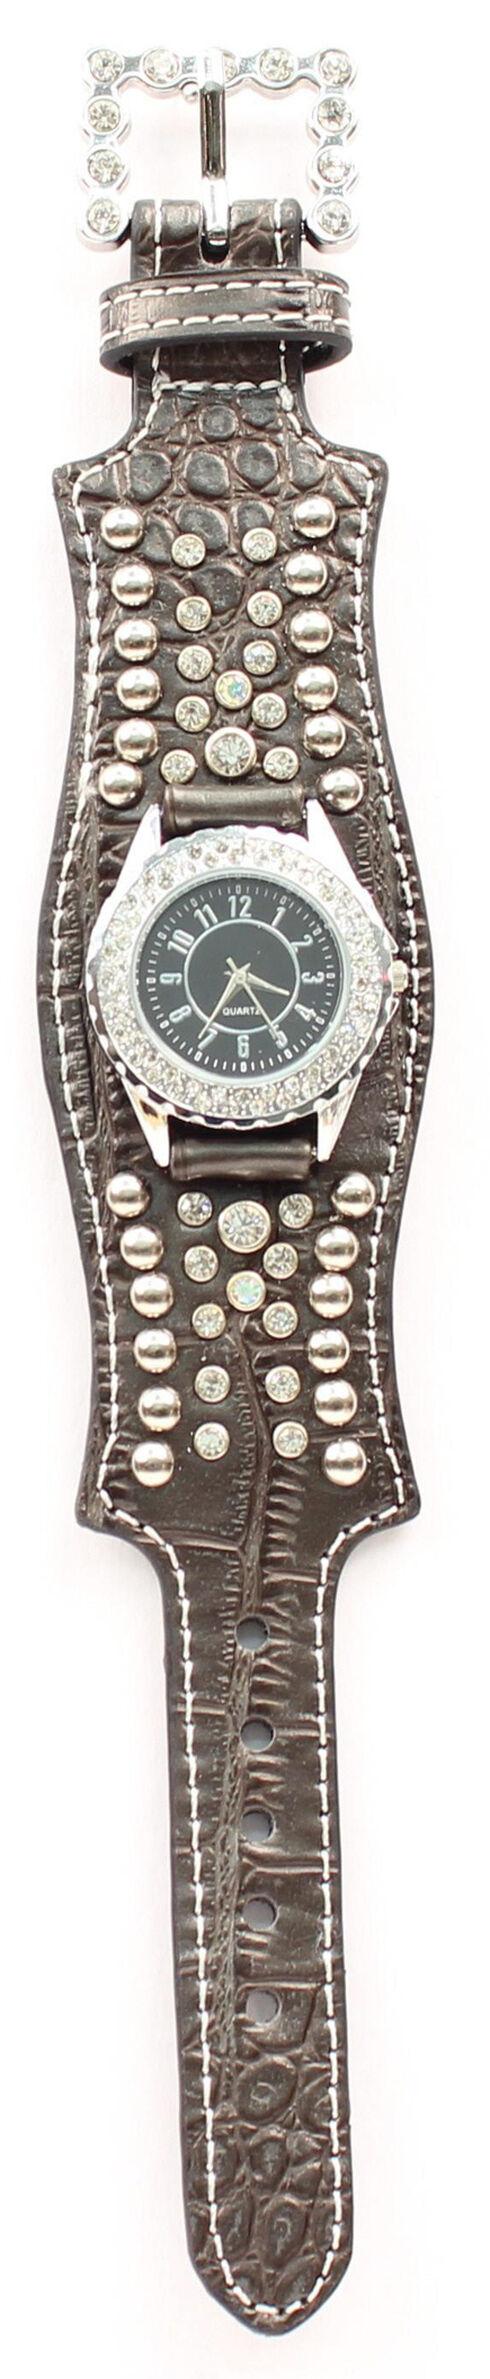 Scalloped Black Croc Print Crystal Watch, Black, hi-res